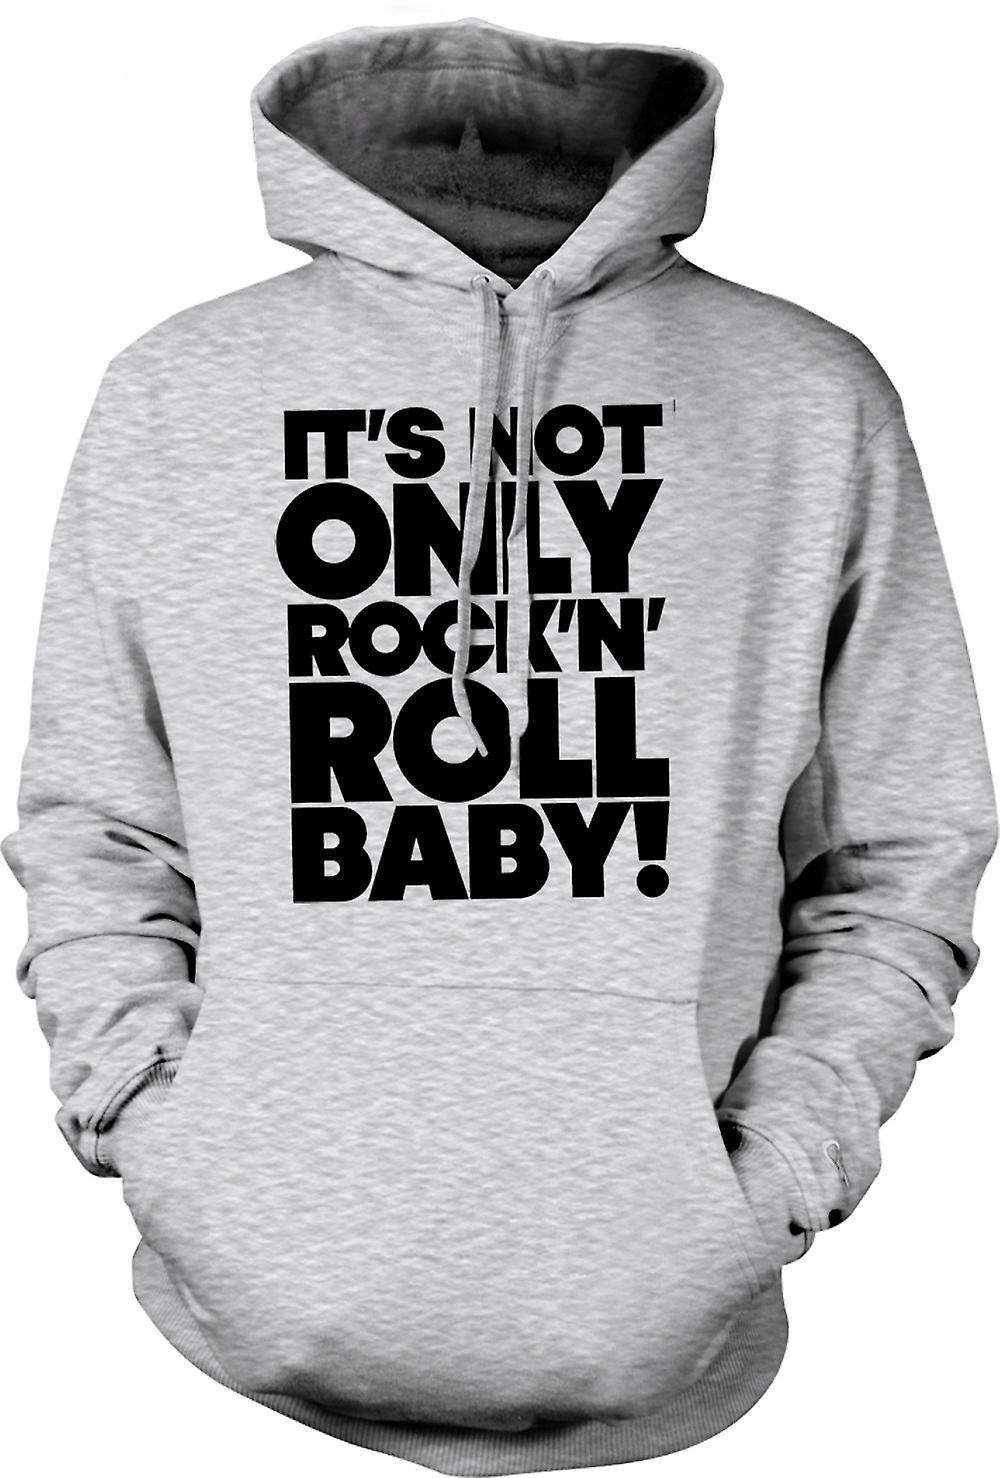 Mens Hoodie - It's Not Only Rock n Roll Baby